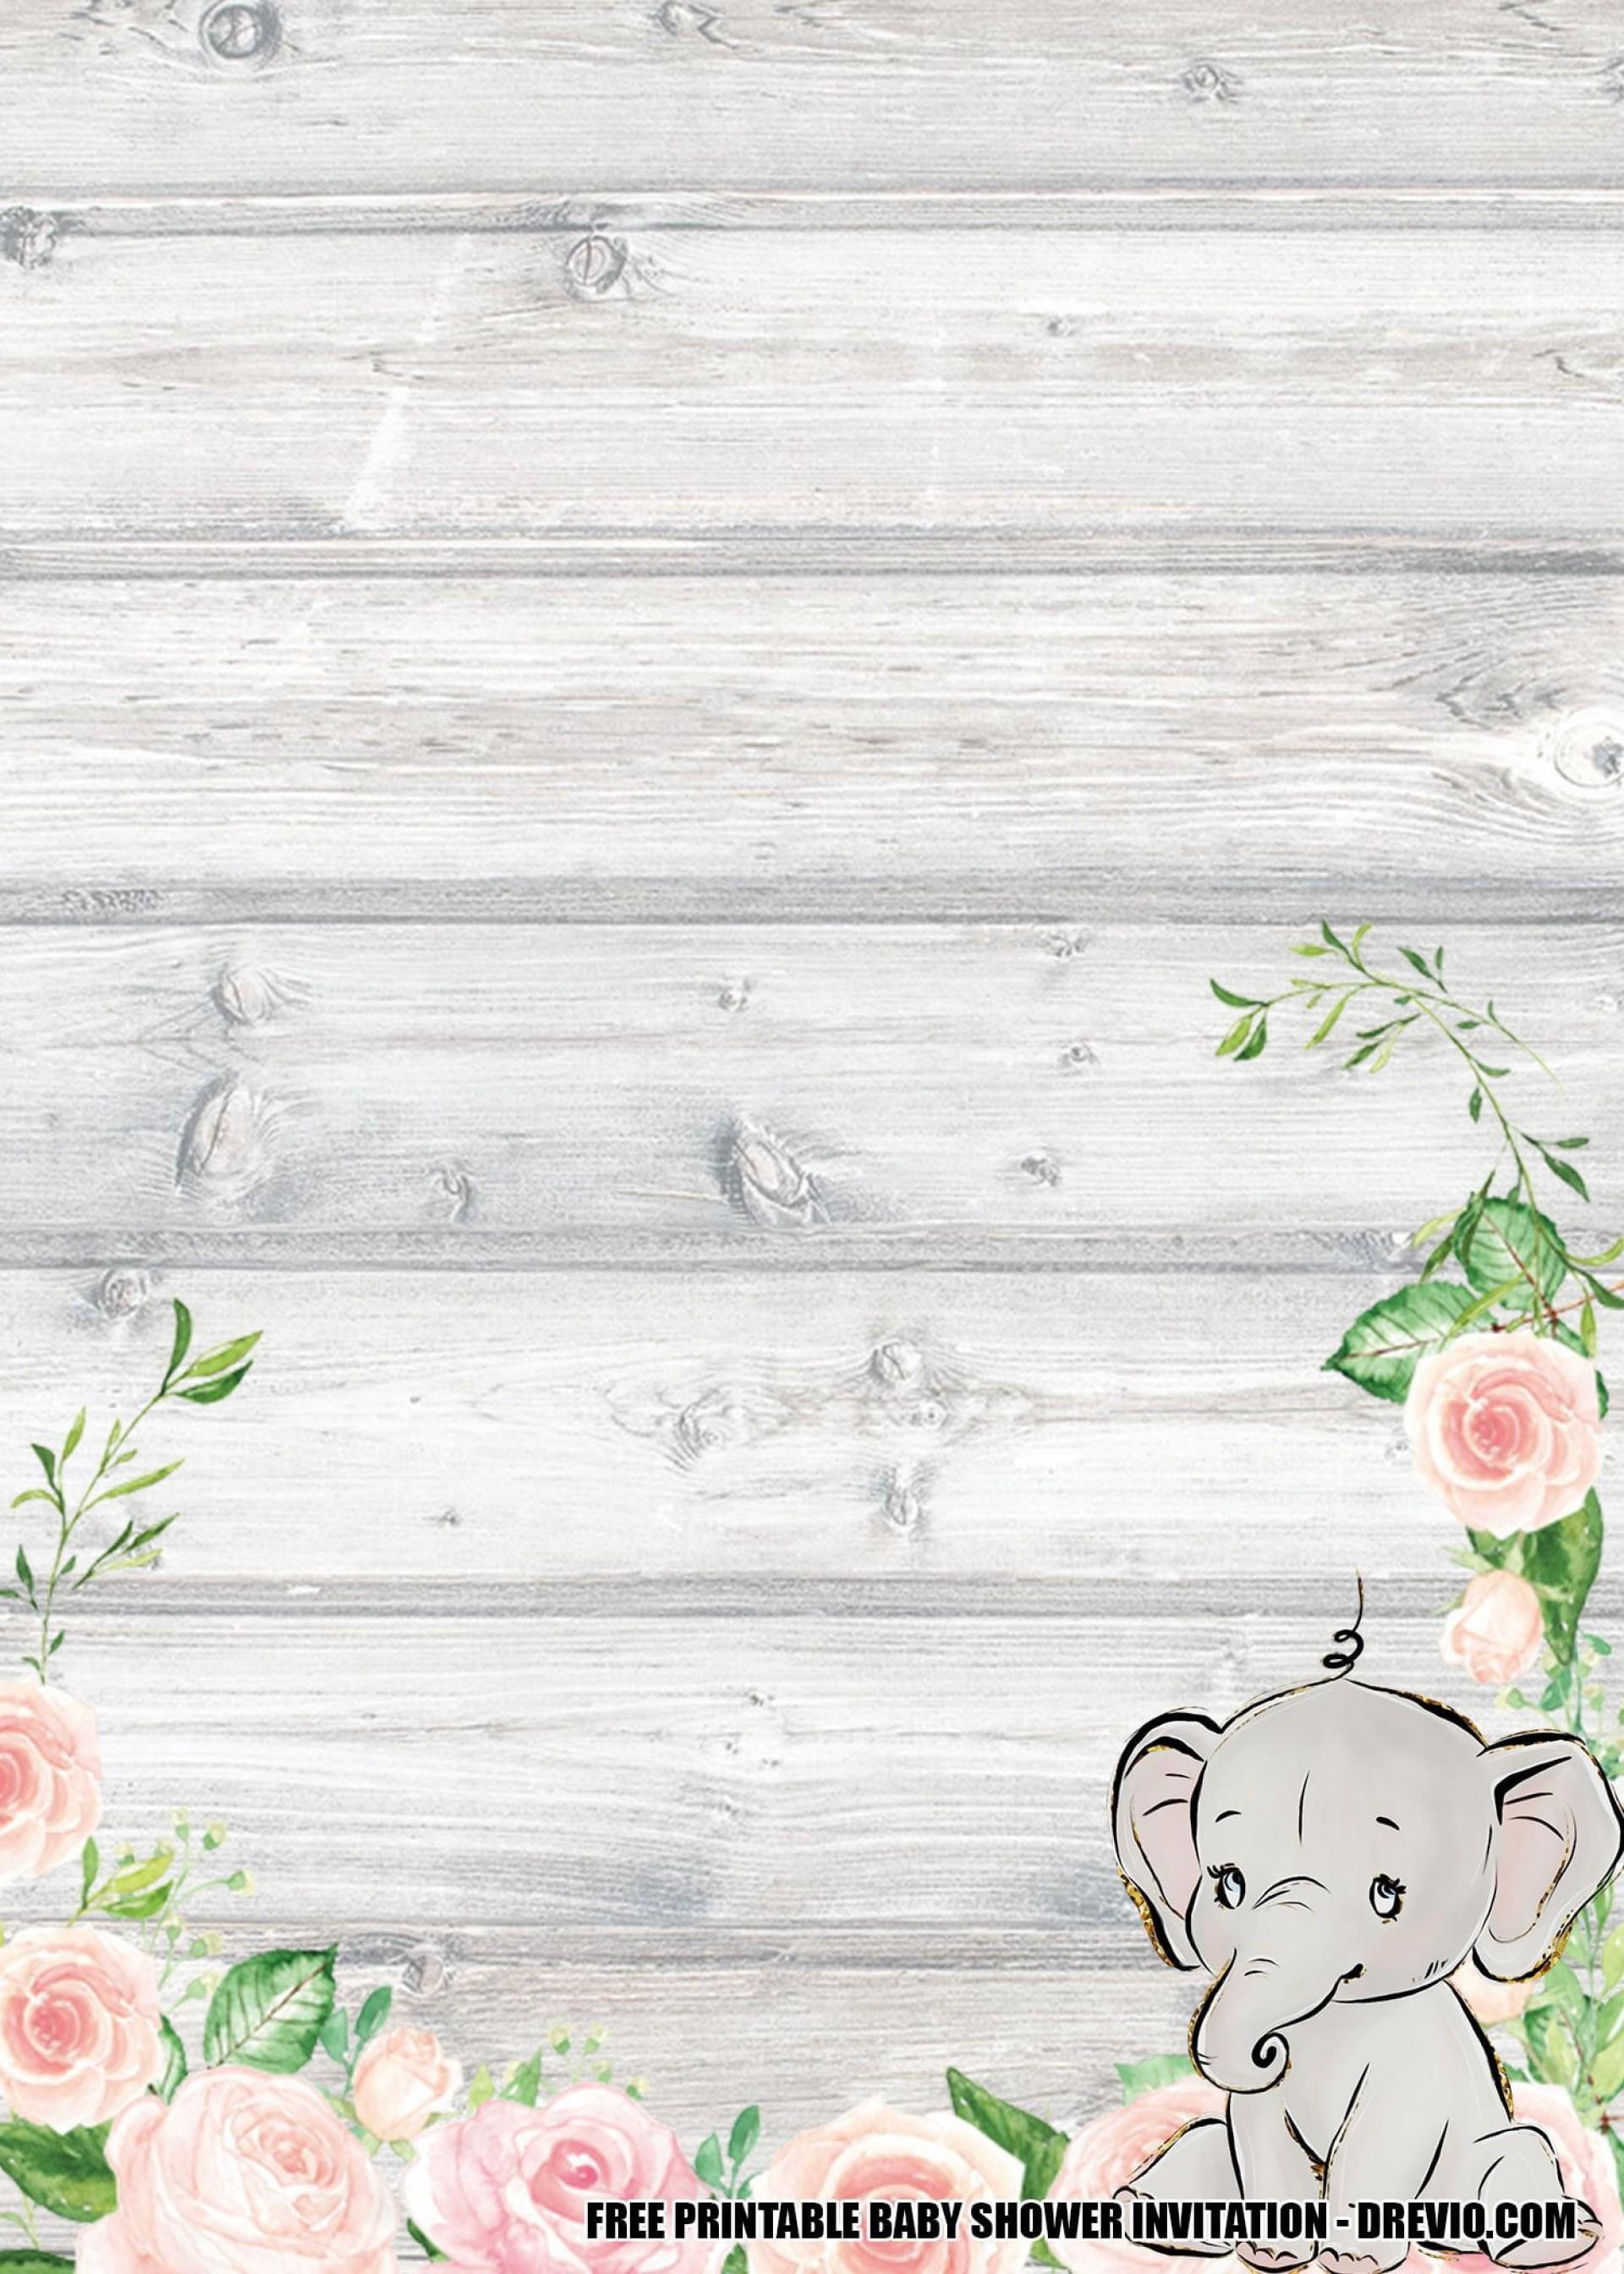 008 Wonderful Free Printable Elephant Baby Shower Invitation Template High Resolution  Templates Editable1920